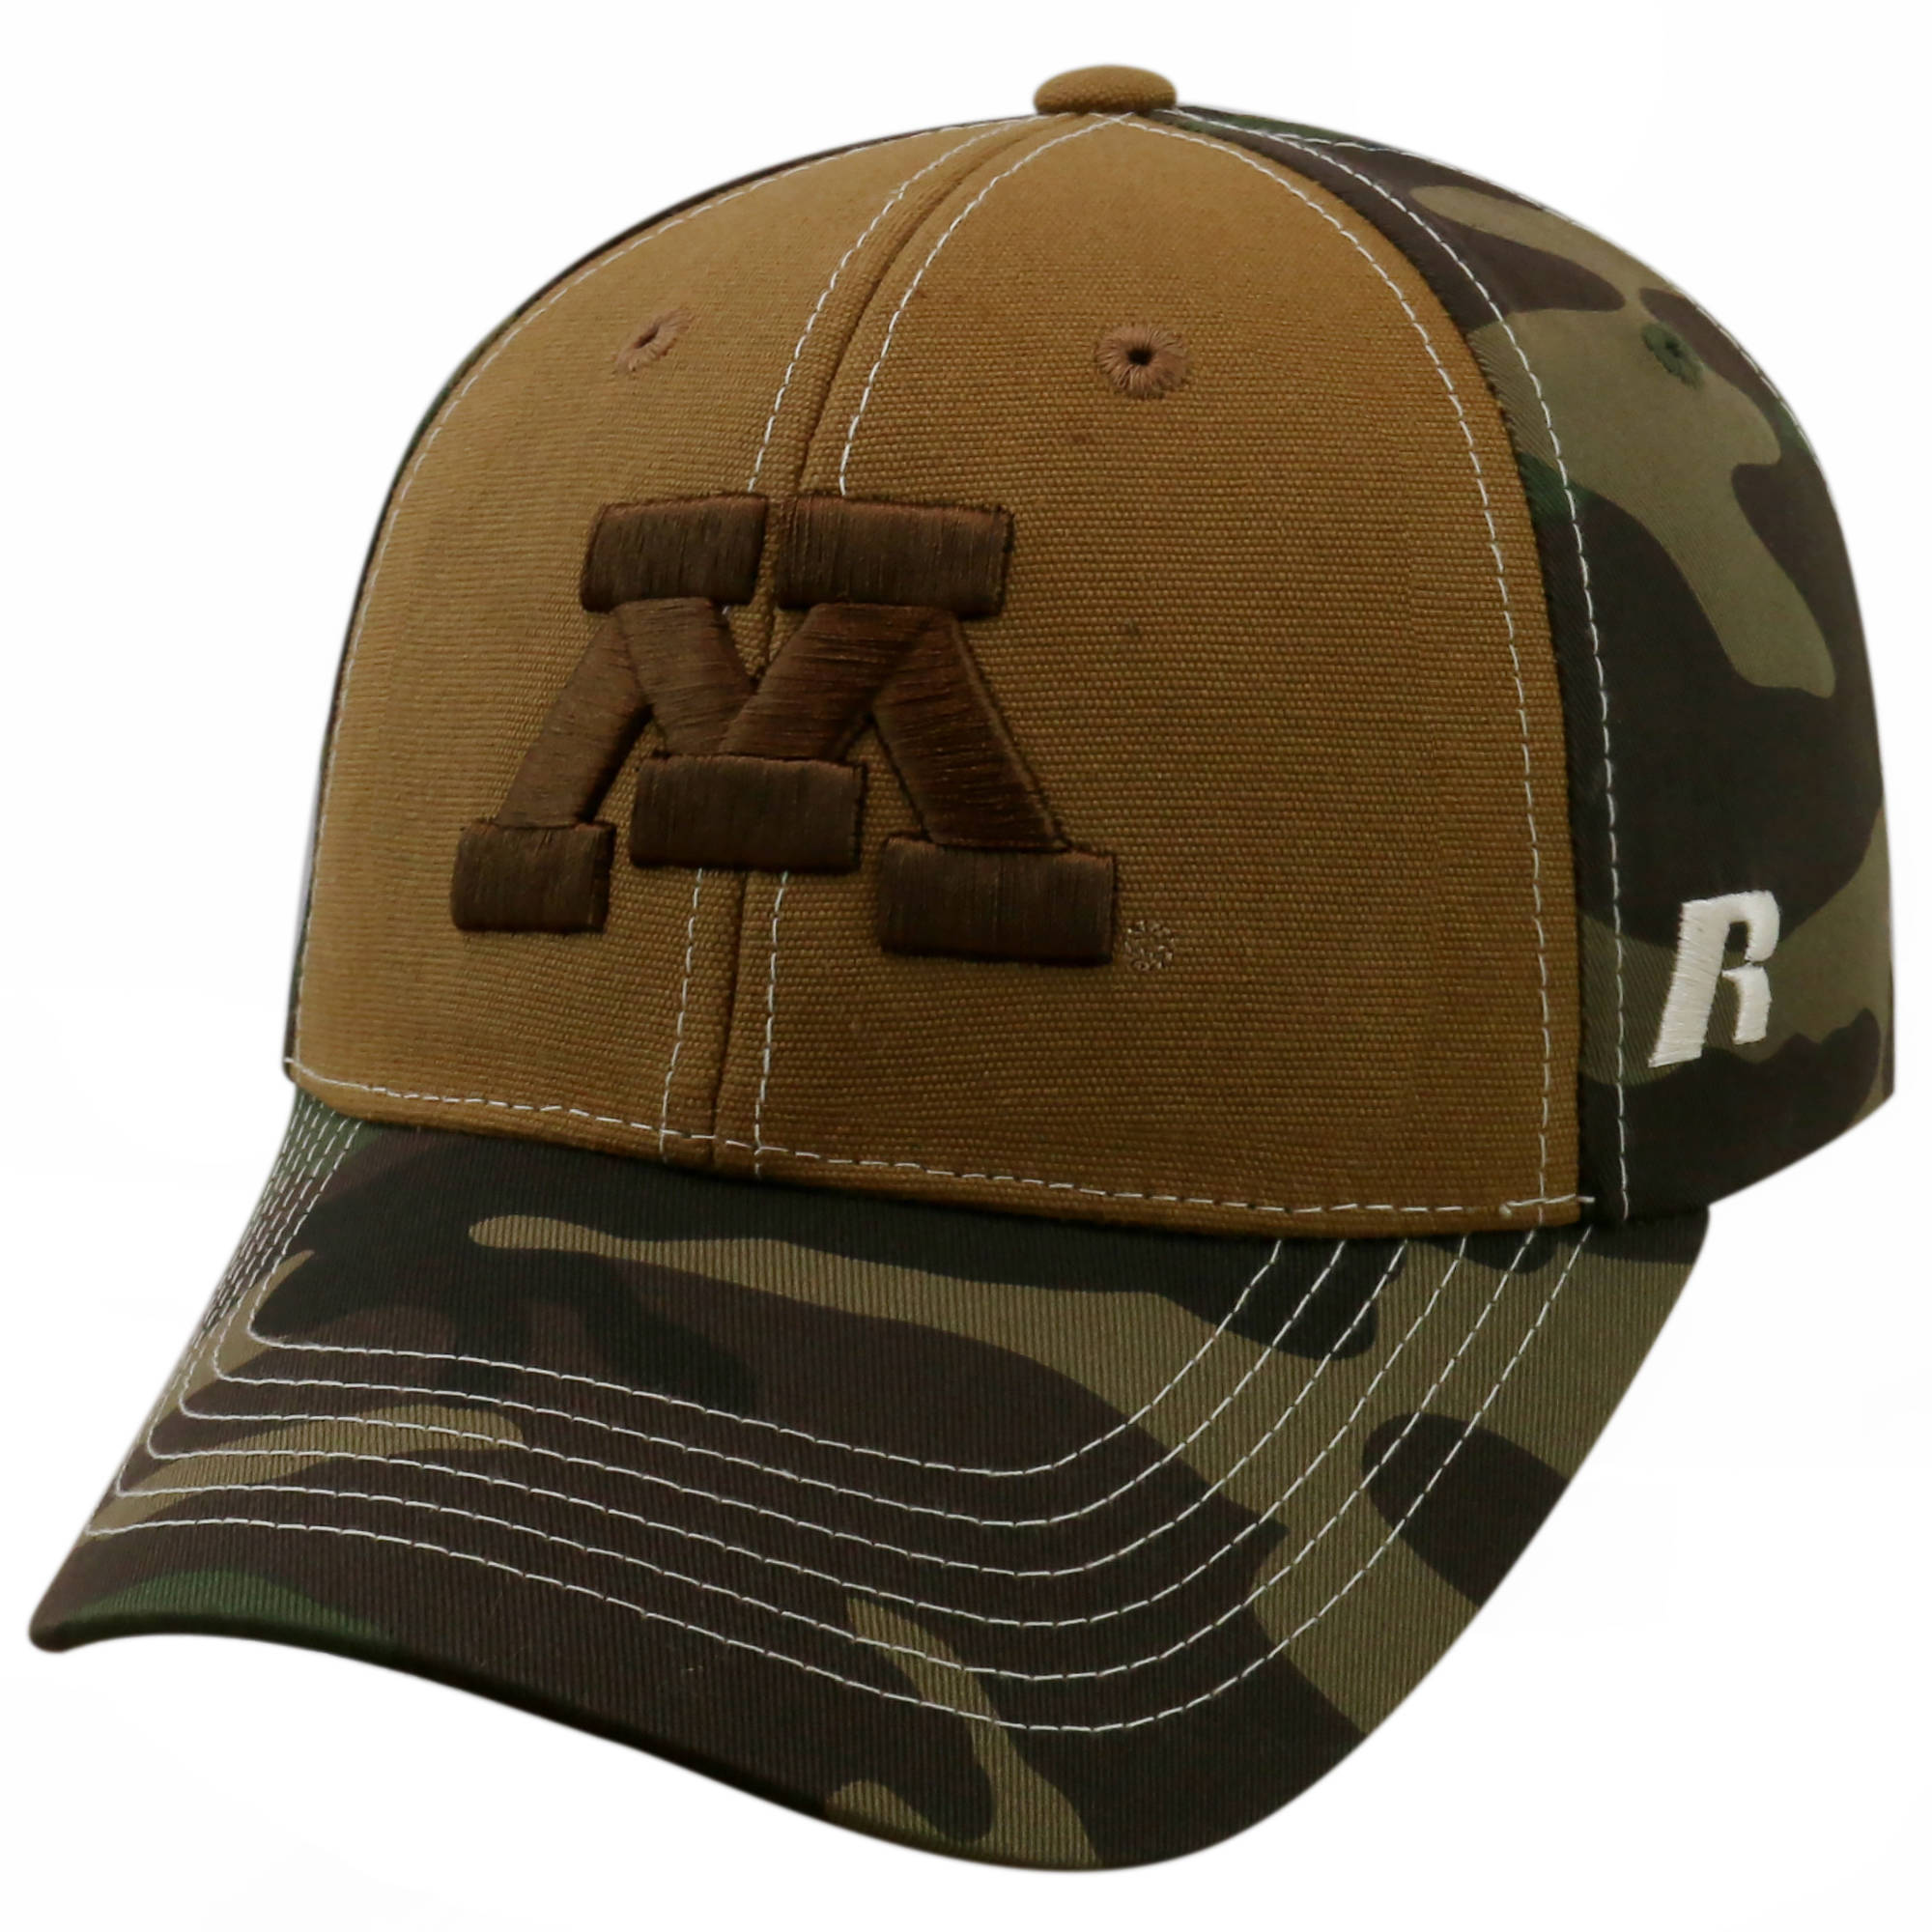 University Of Minnesota Golden Gophers Mossy Baseball Cap